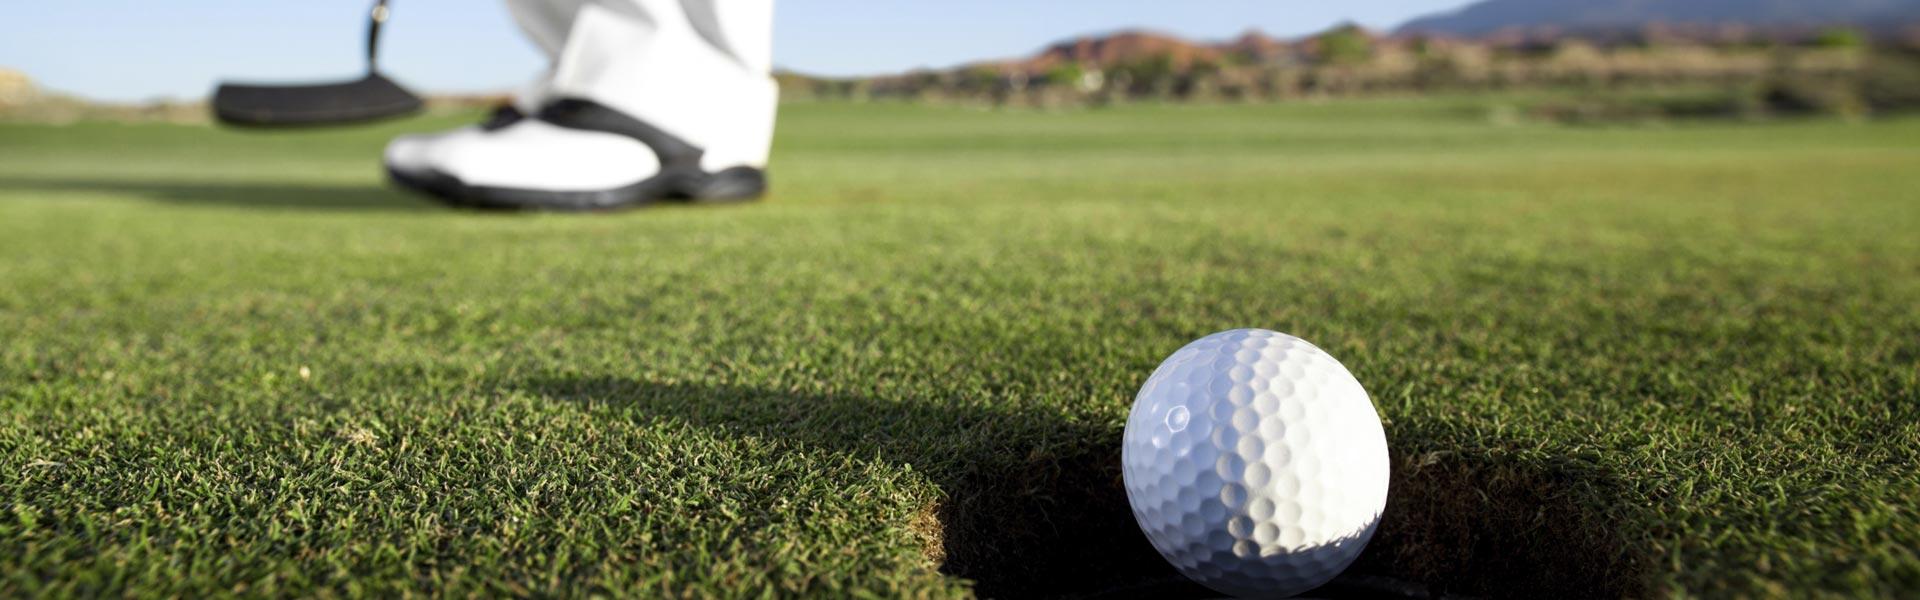 golf_head